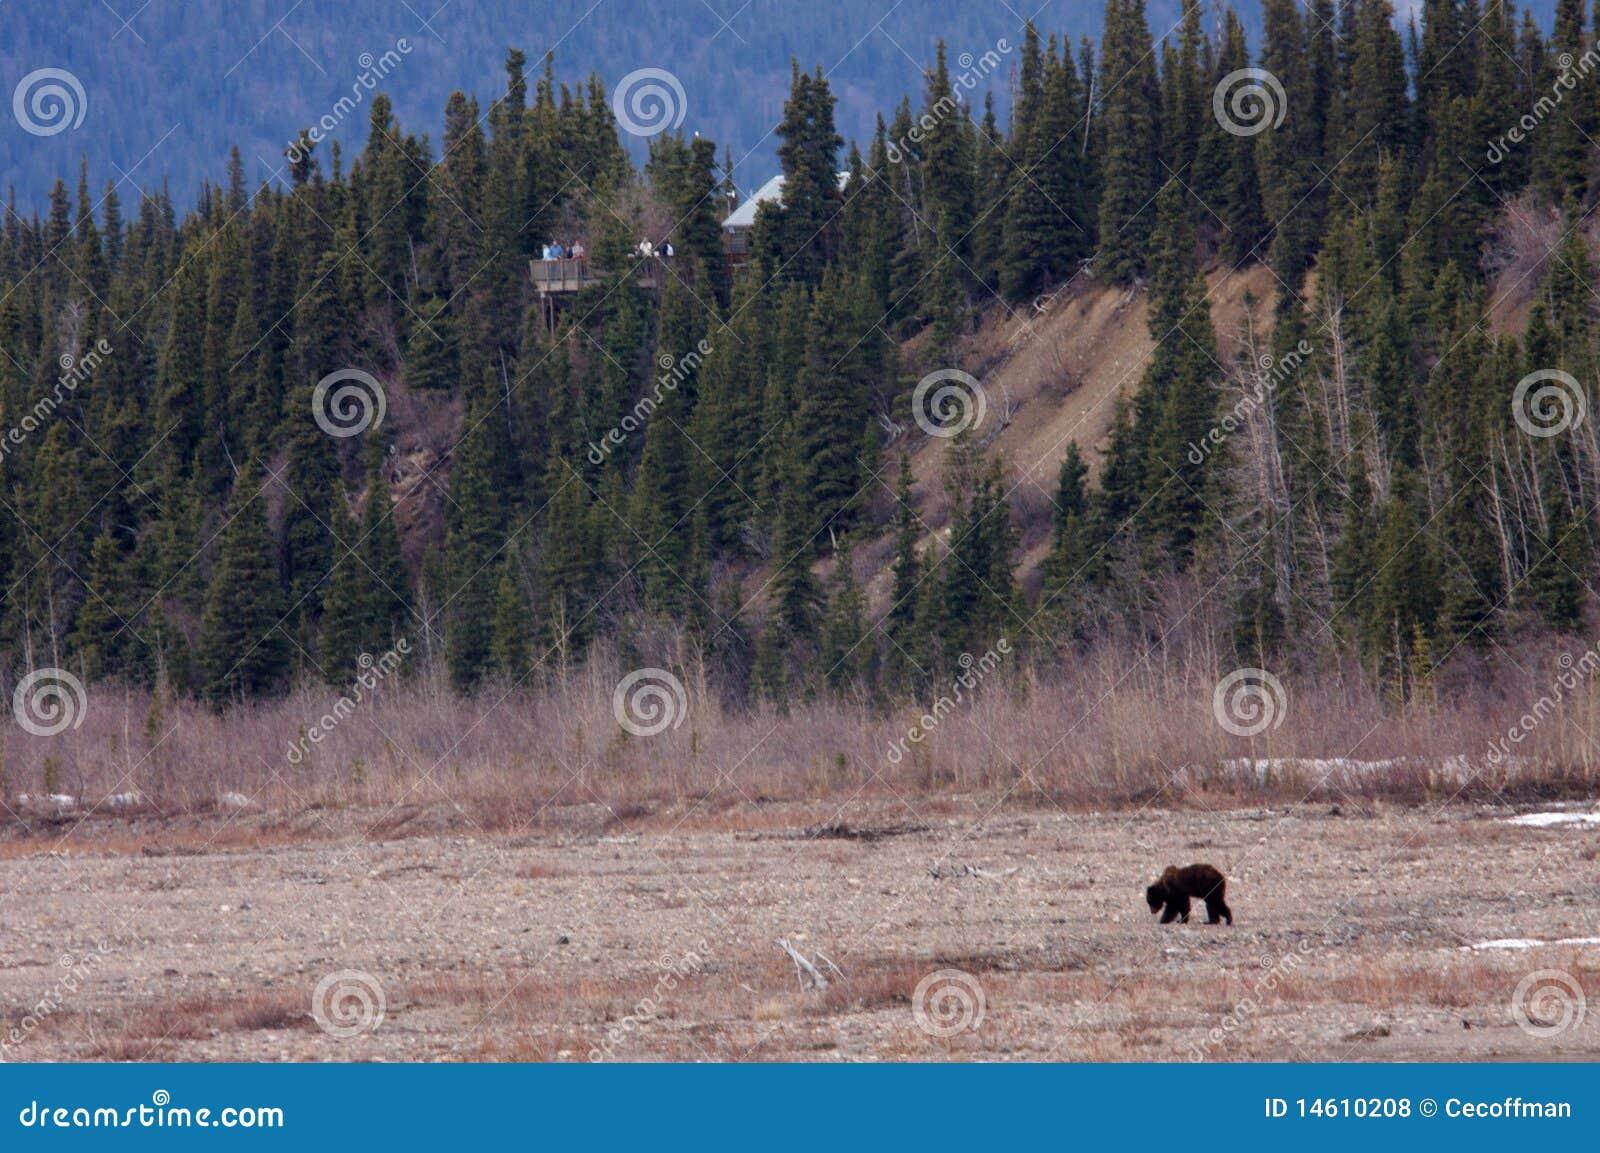 Viewing национального парка denali медведя